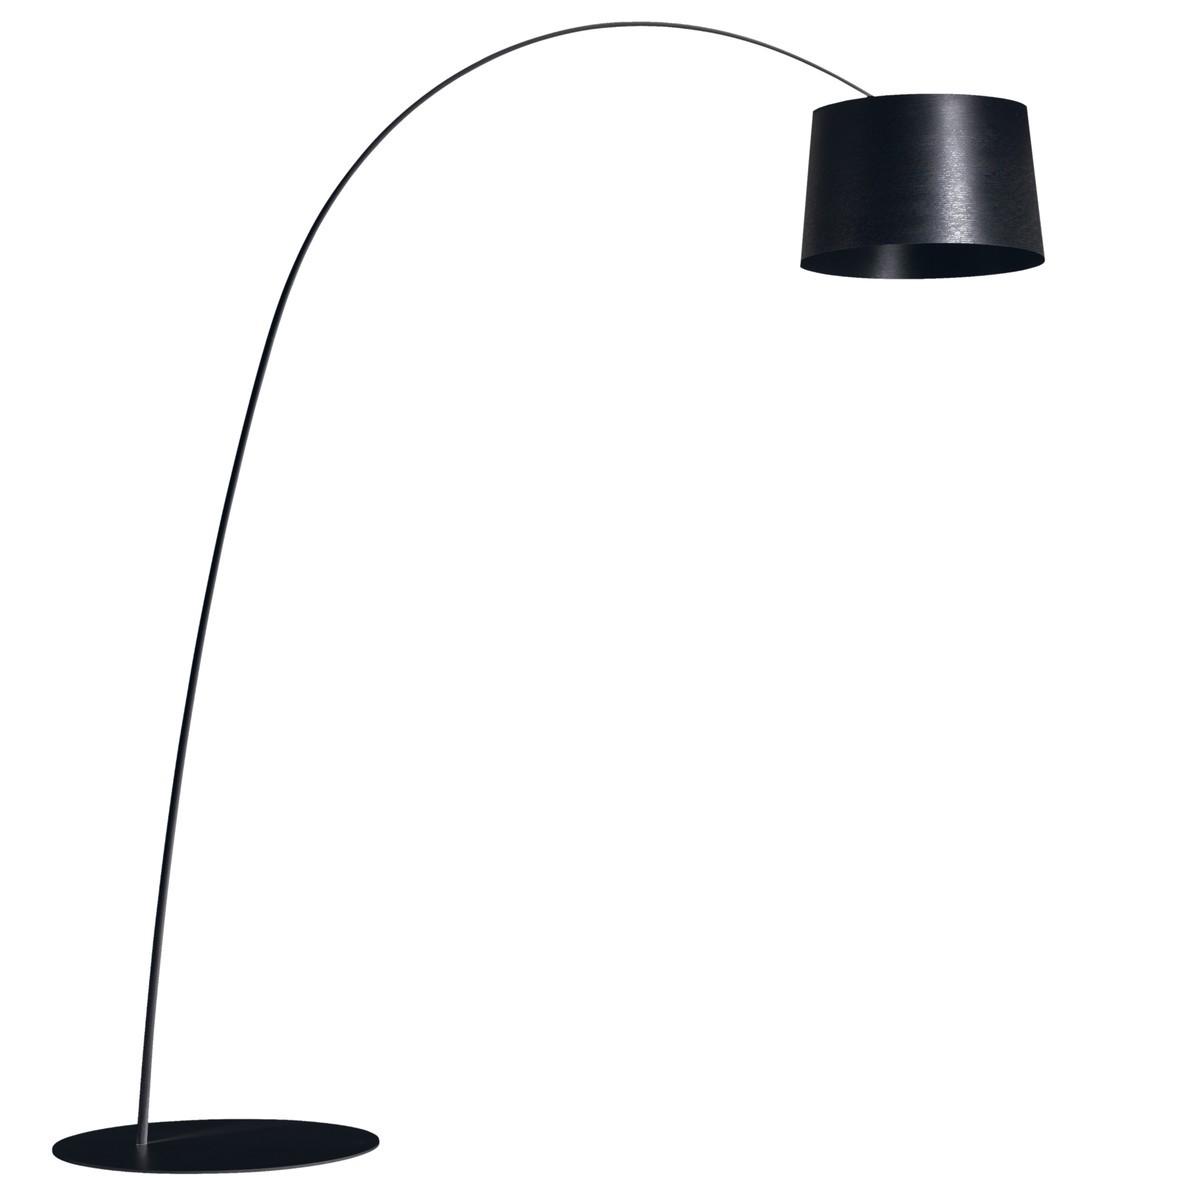 Foscarini Twiggy Small Floor Lamp Deplaincom